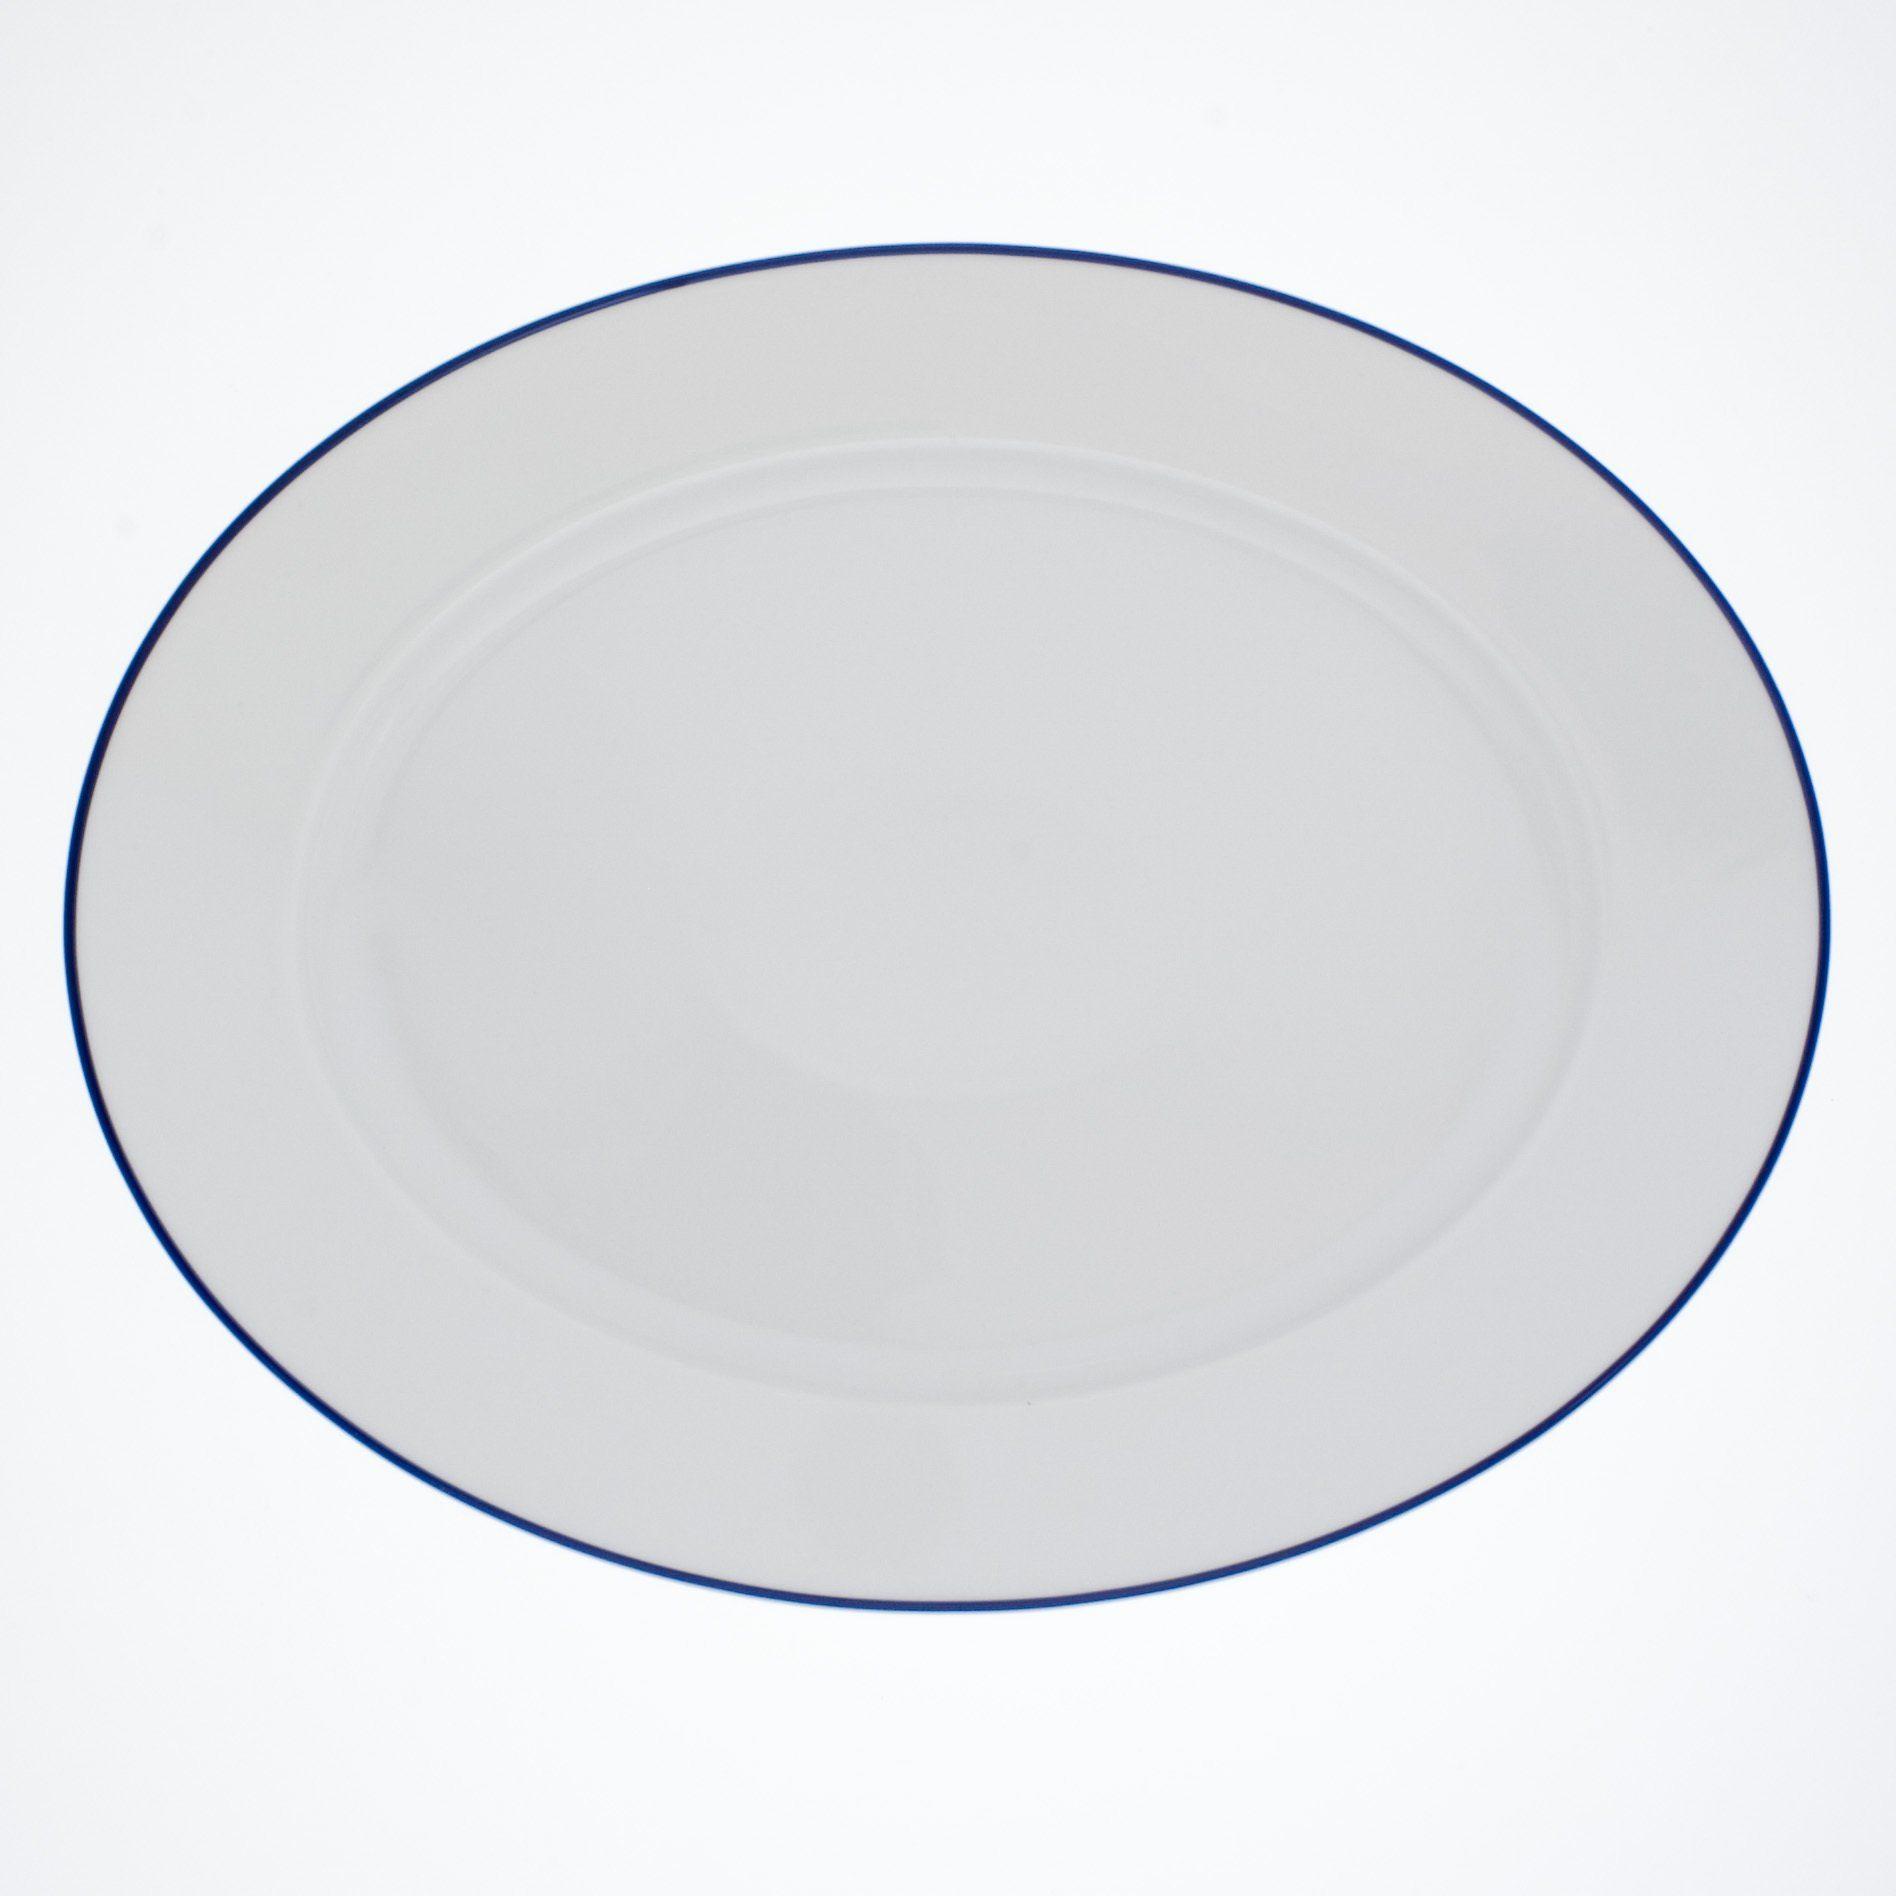 Kahla Platte »Aronda Blaue Linie«